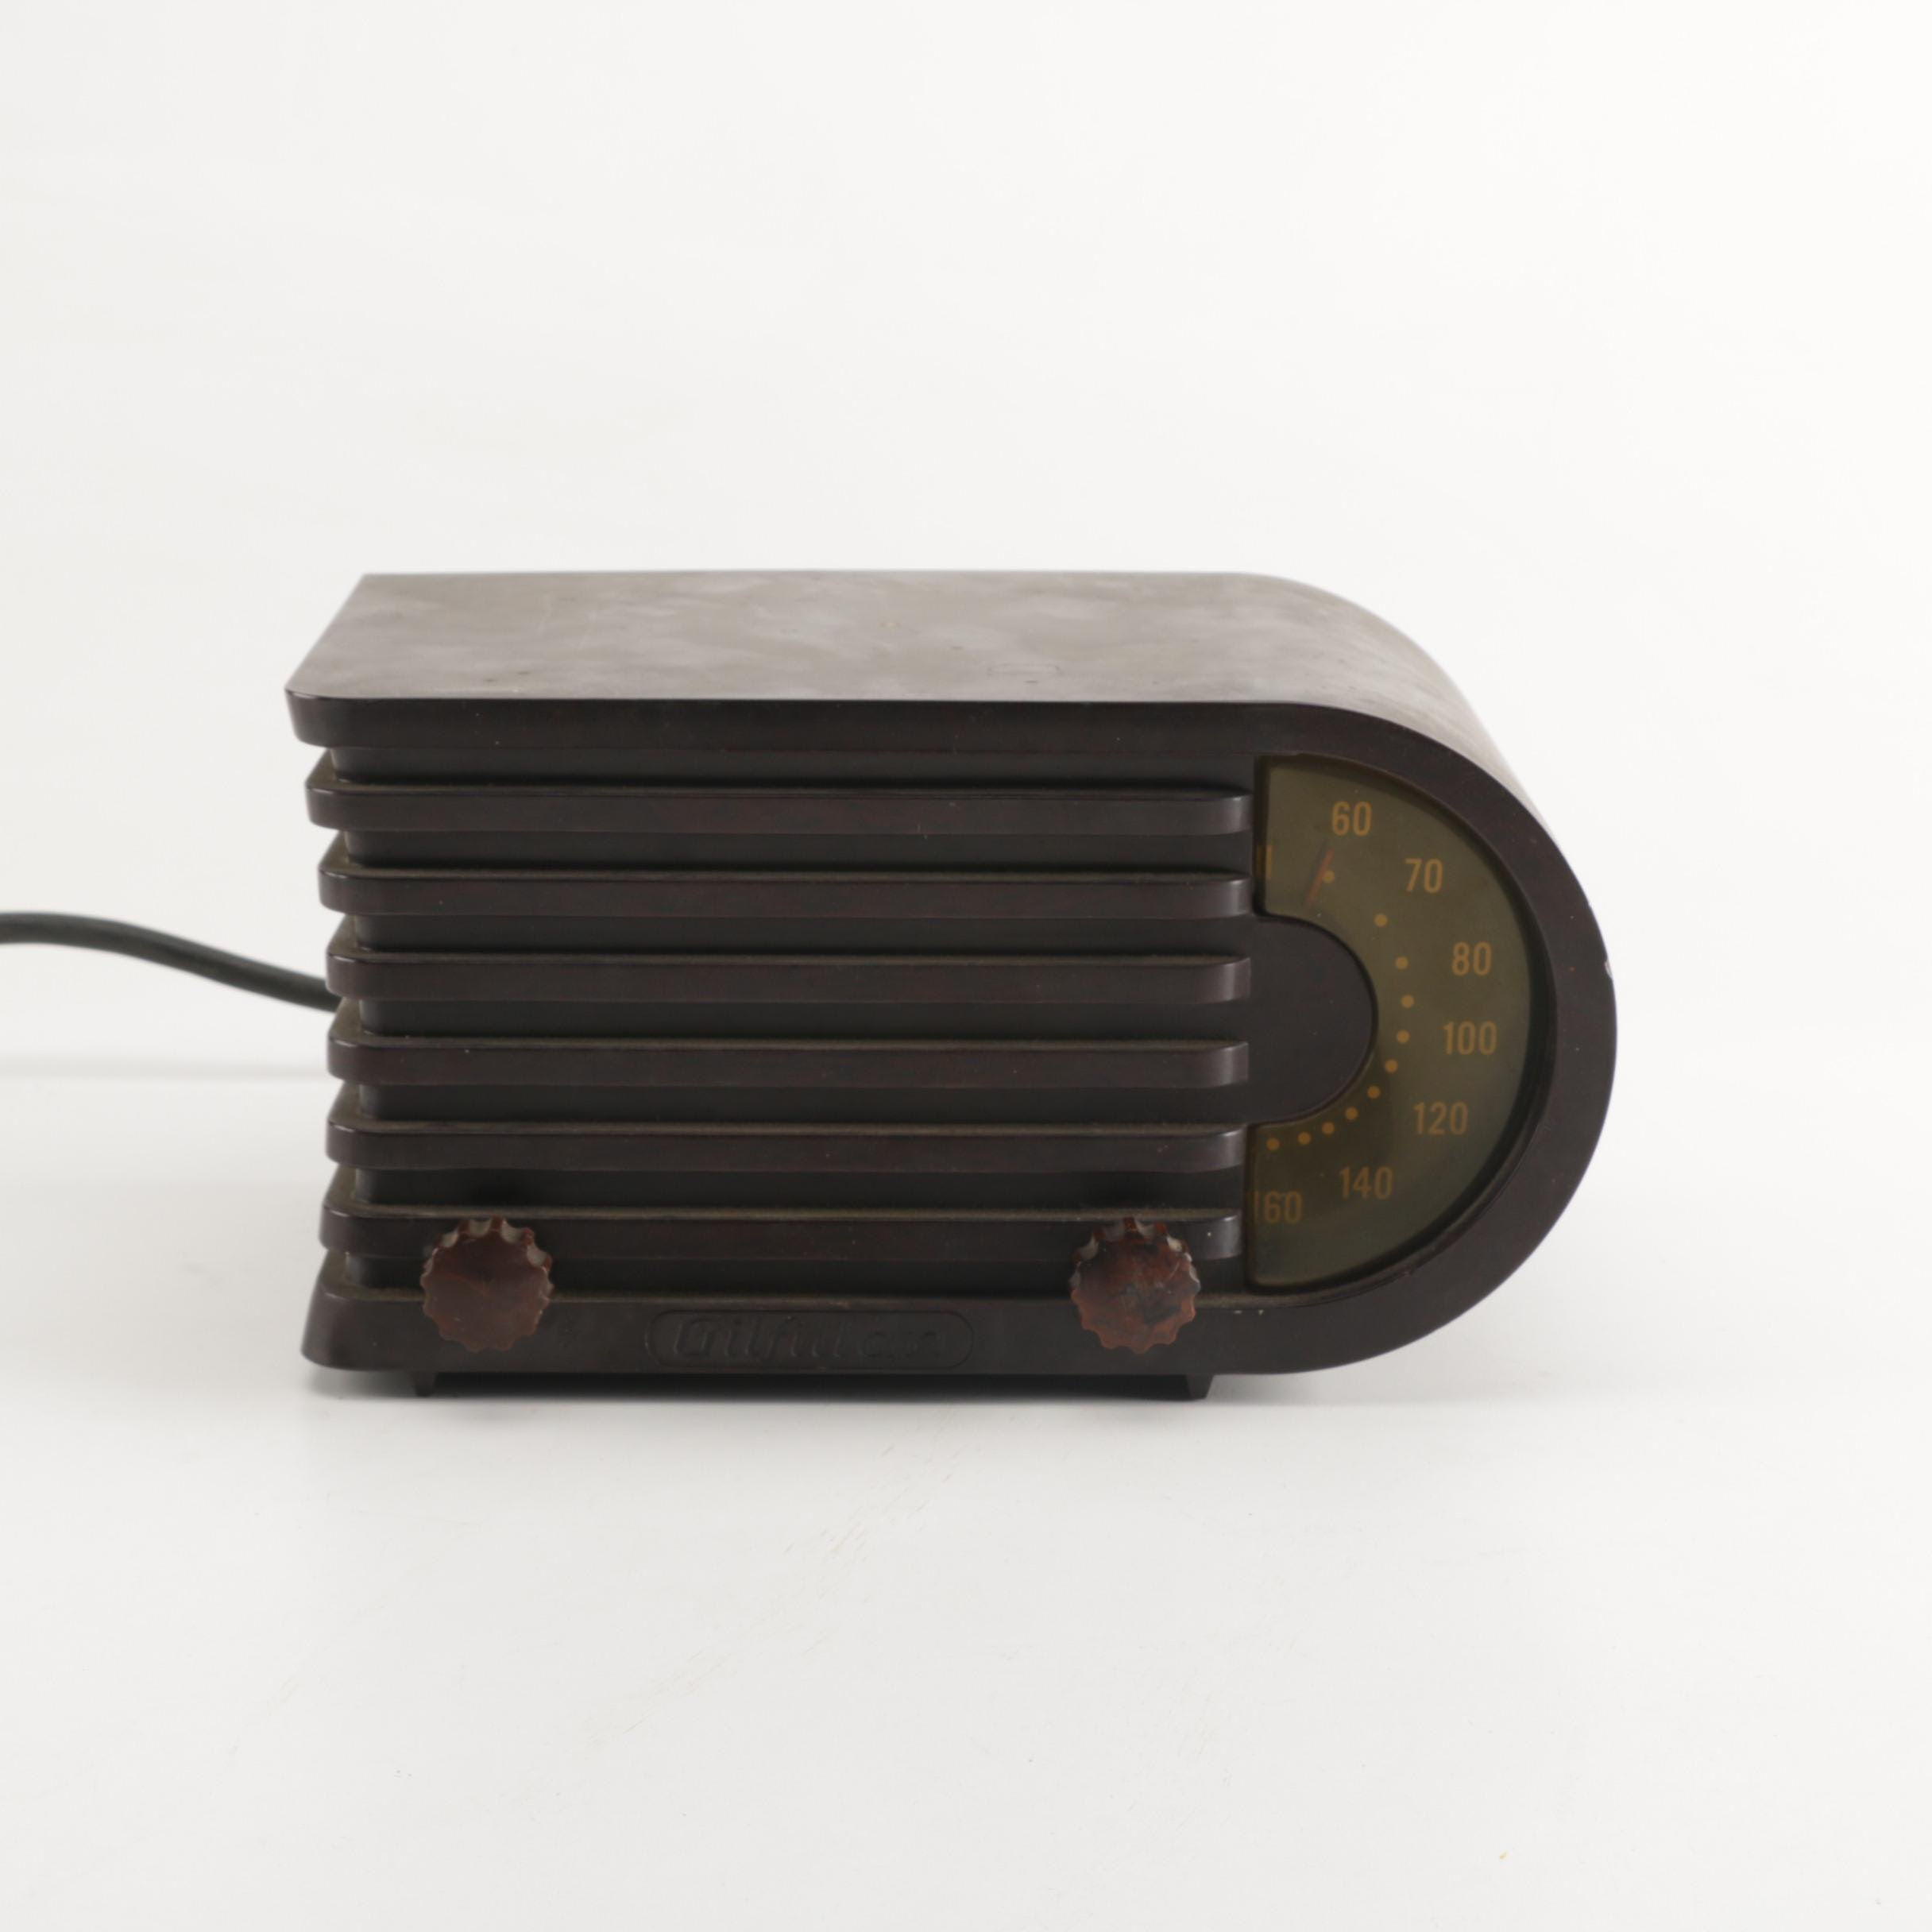 Vintage Gilfillan Radio